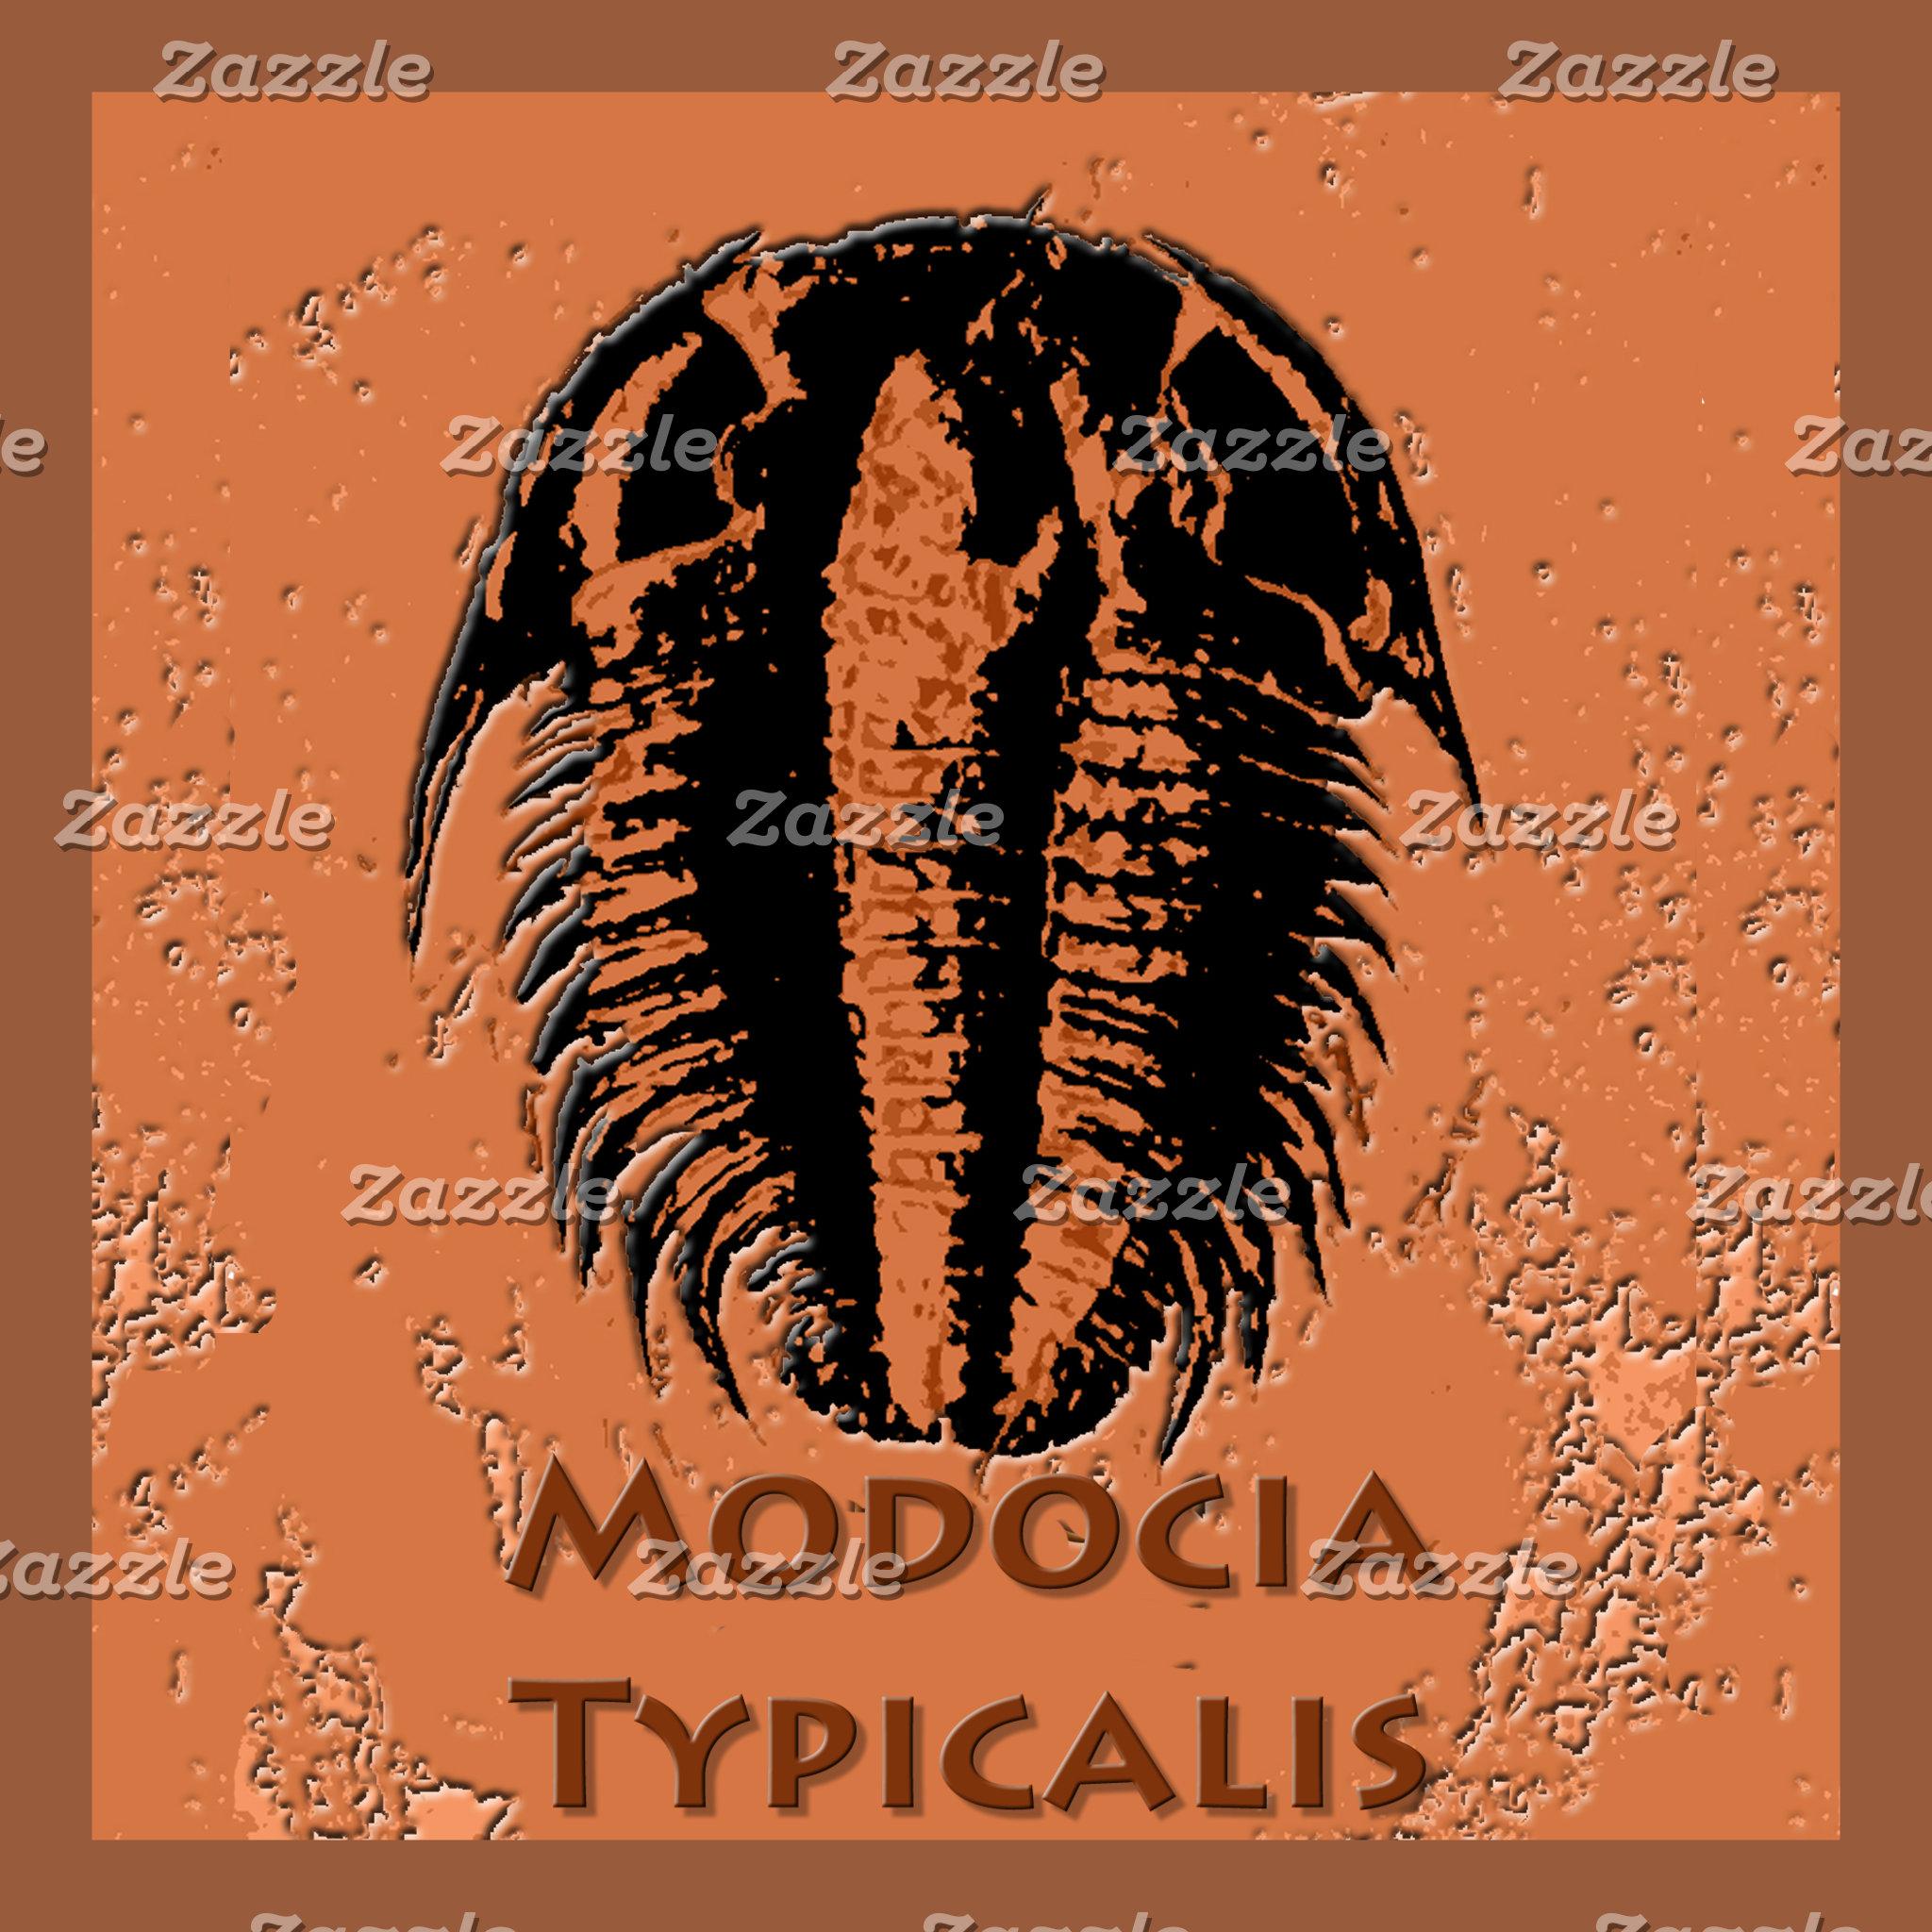 Modocia Typicalis